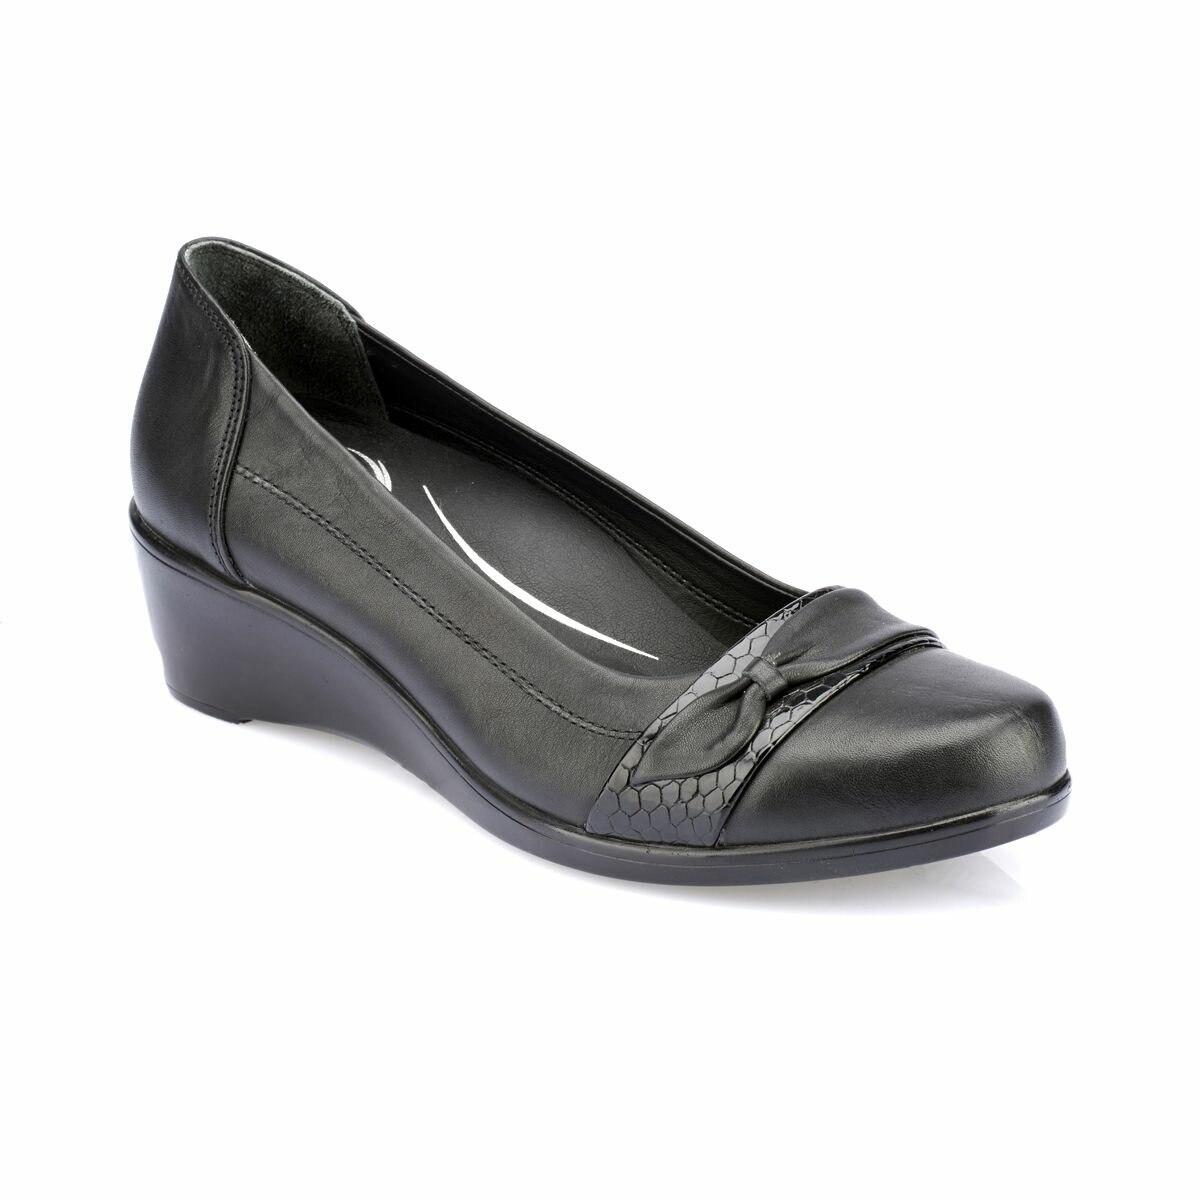 FLO 82.100157.Z Black Women Shoes Polaris 5 Point